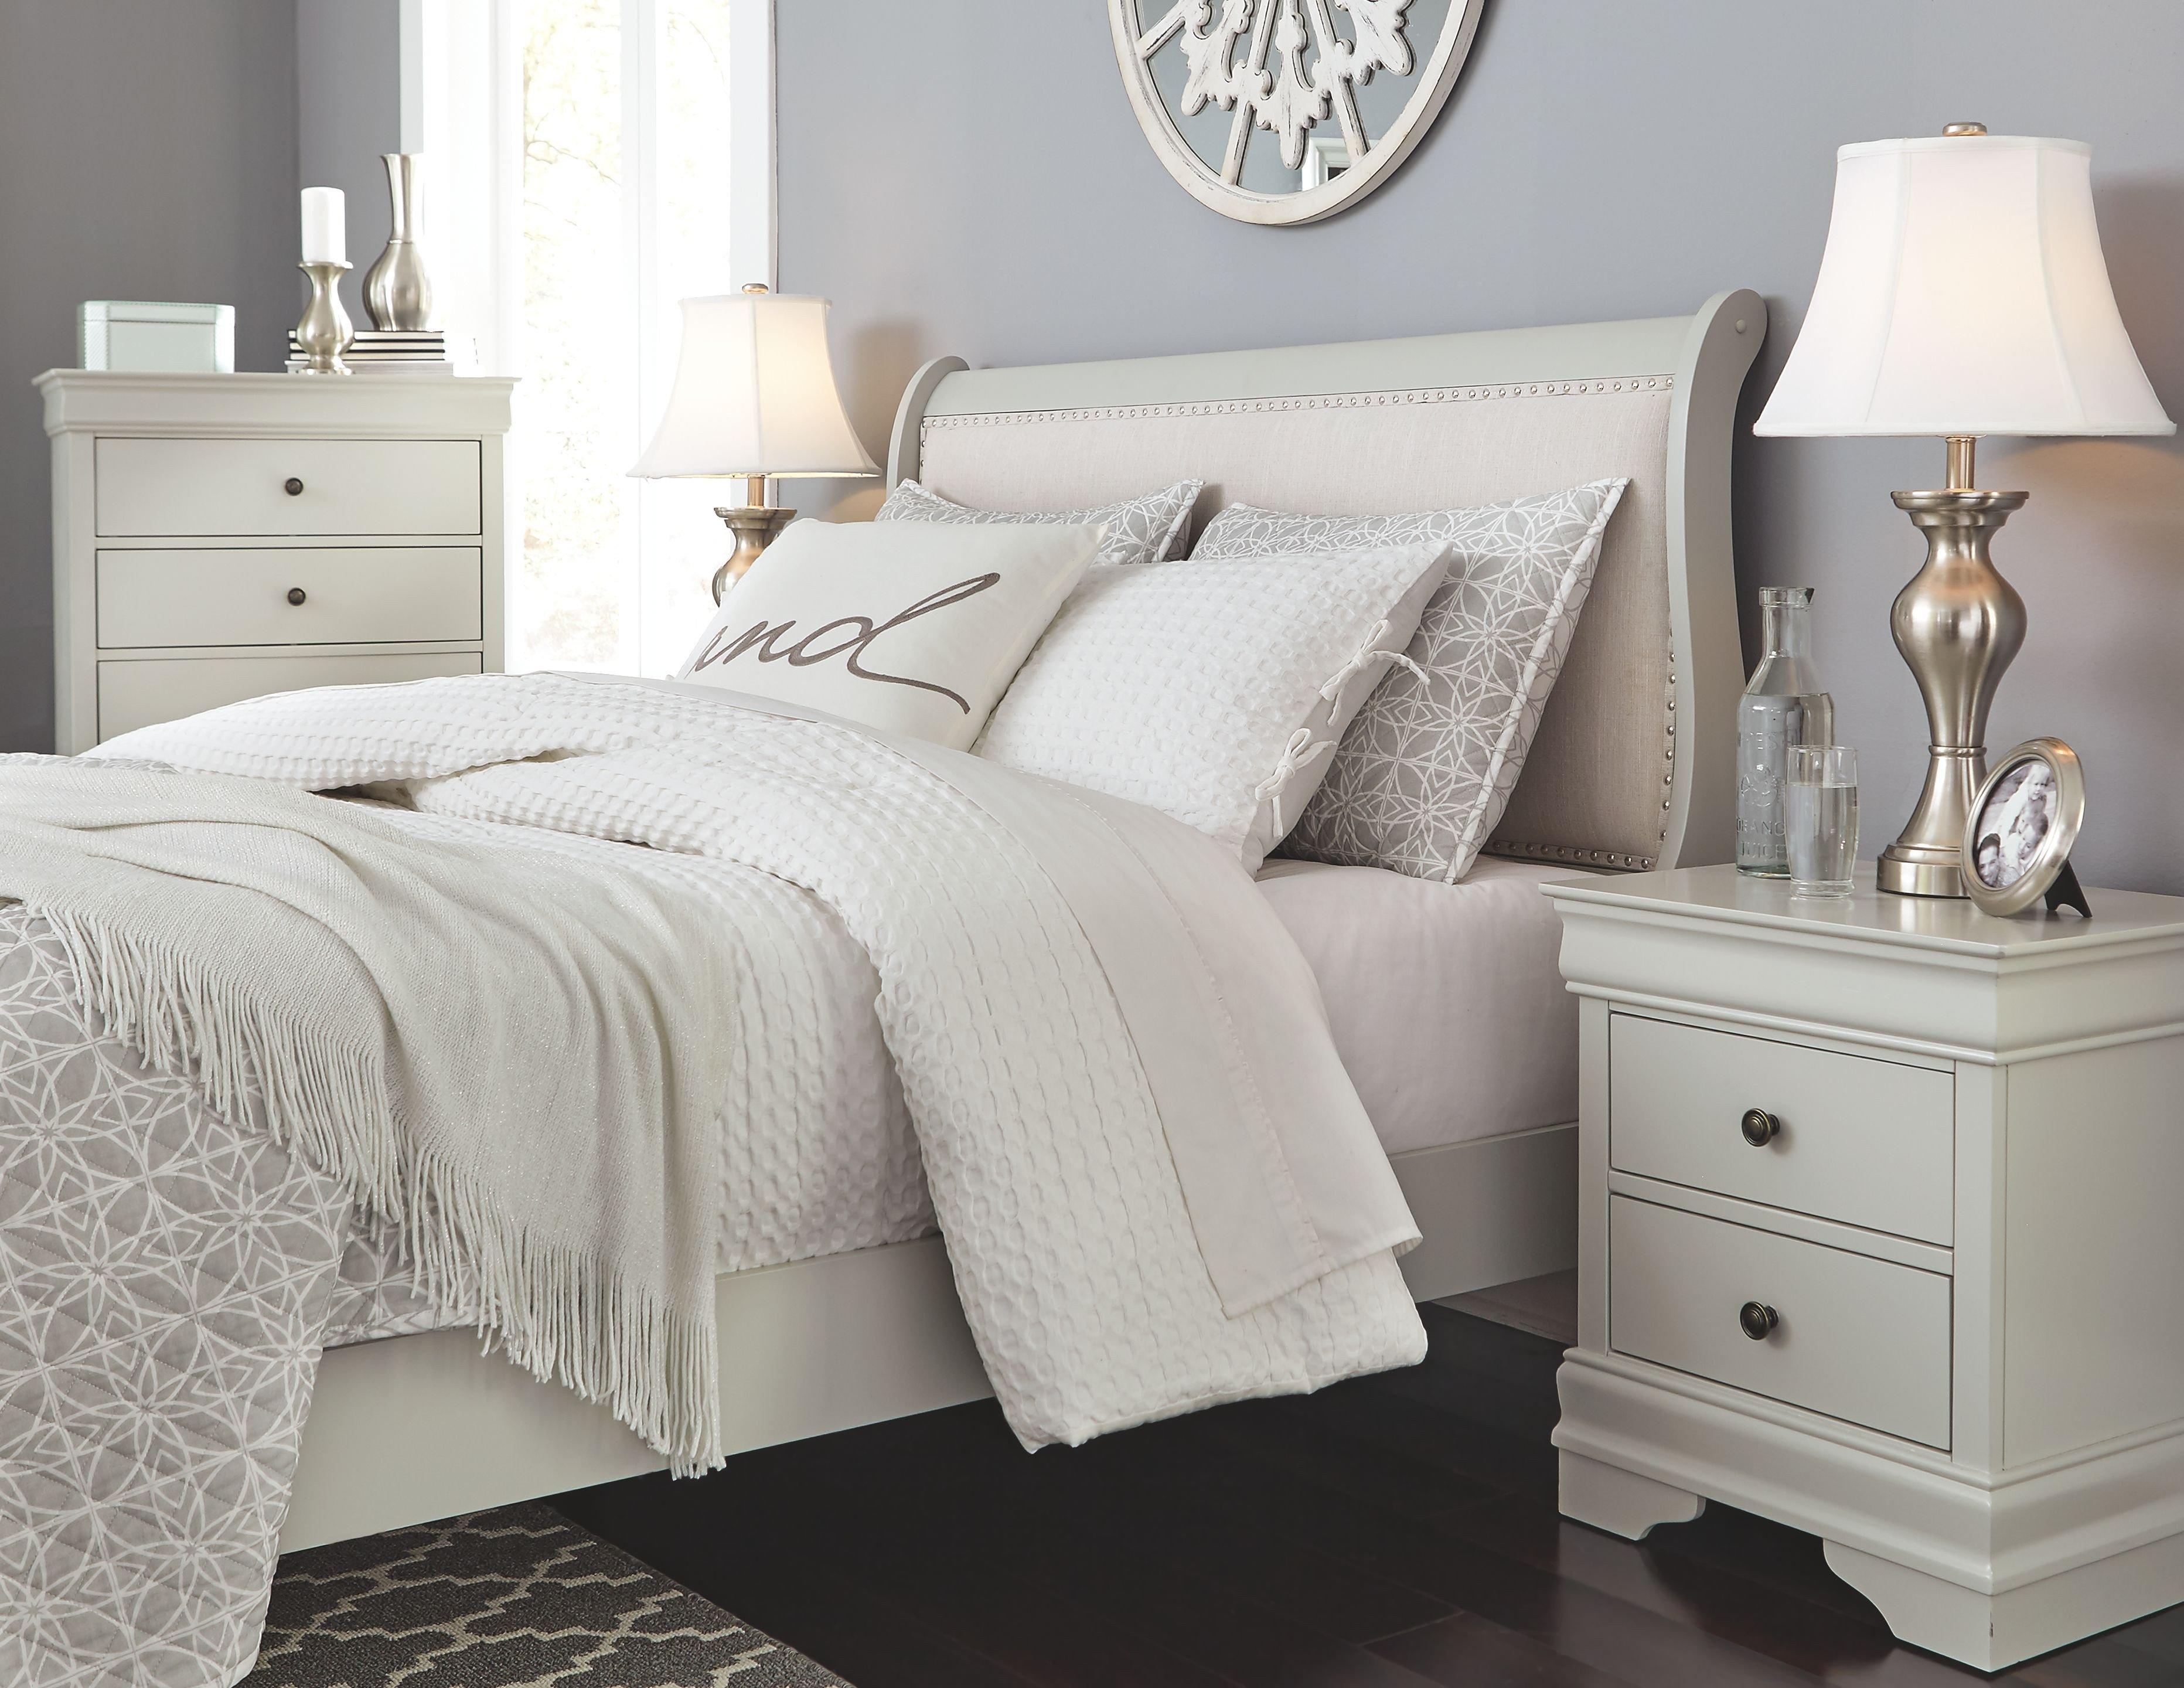 Best Place to Buy Bedroom Furniture Luxury Jorstad Full Bed with 2 Nightstands Gray